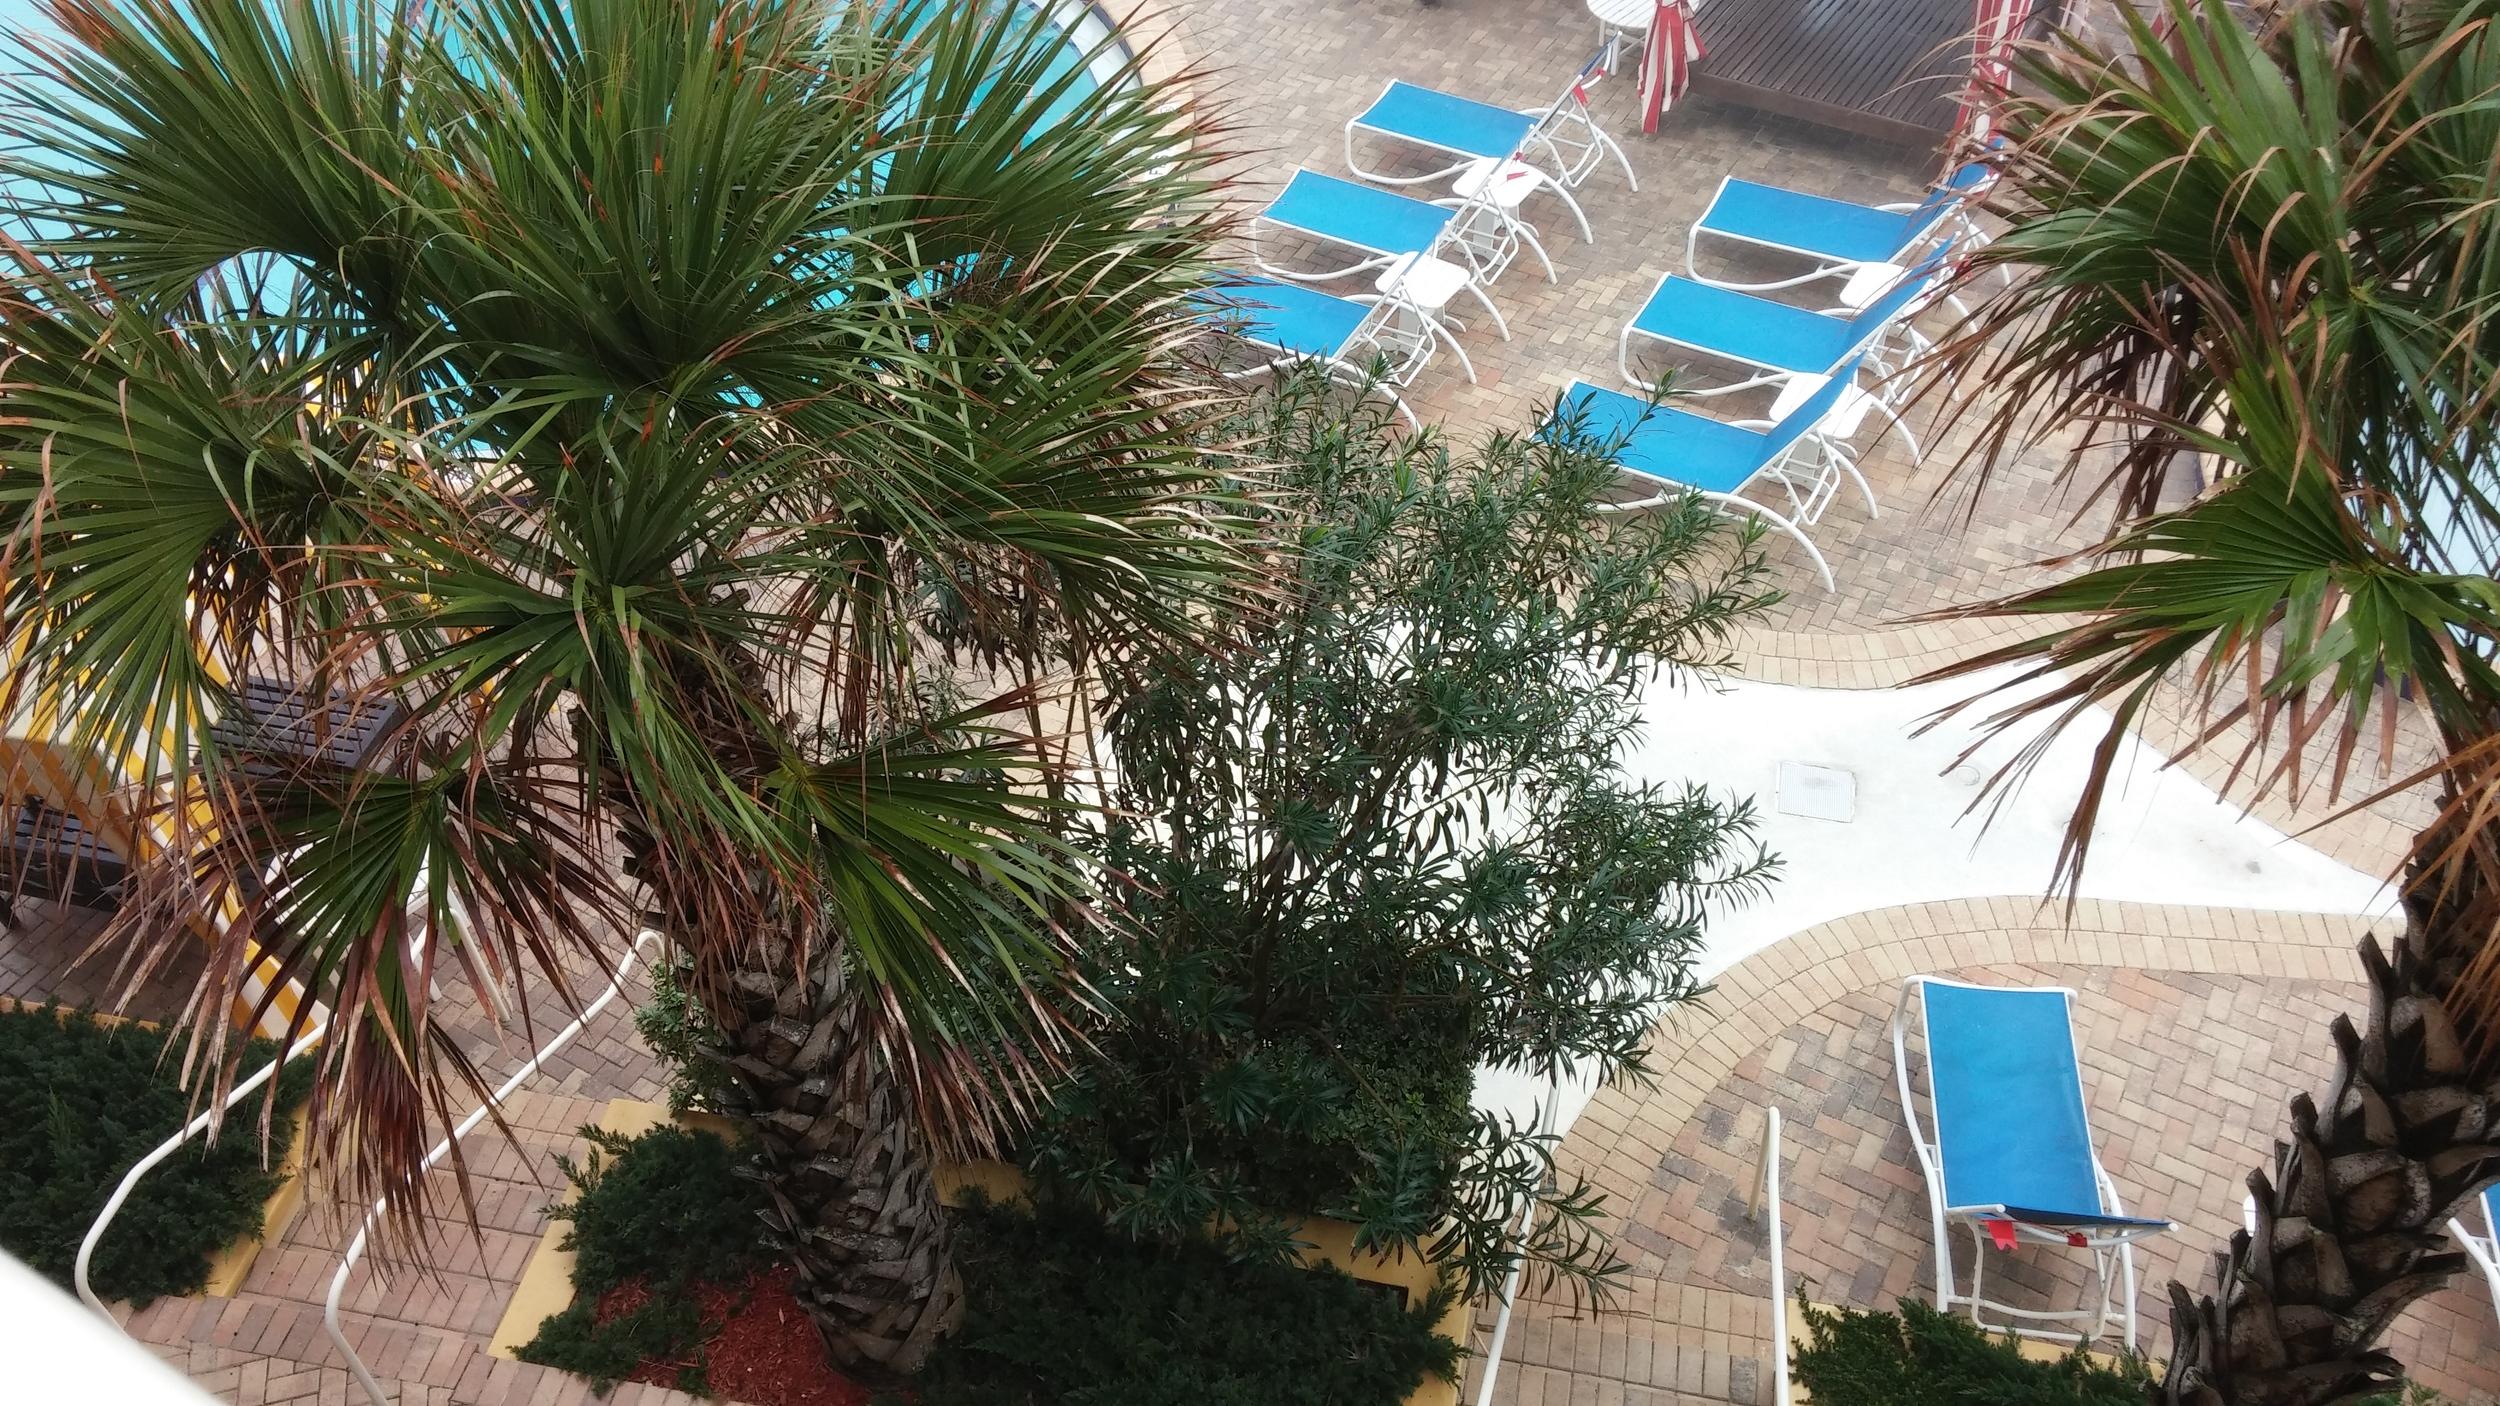 2016-01-08 The Shores Resort and Spa, Daytona Beach FL 1.jpg